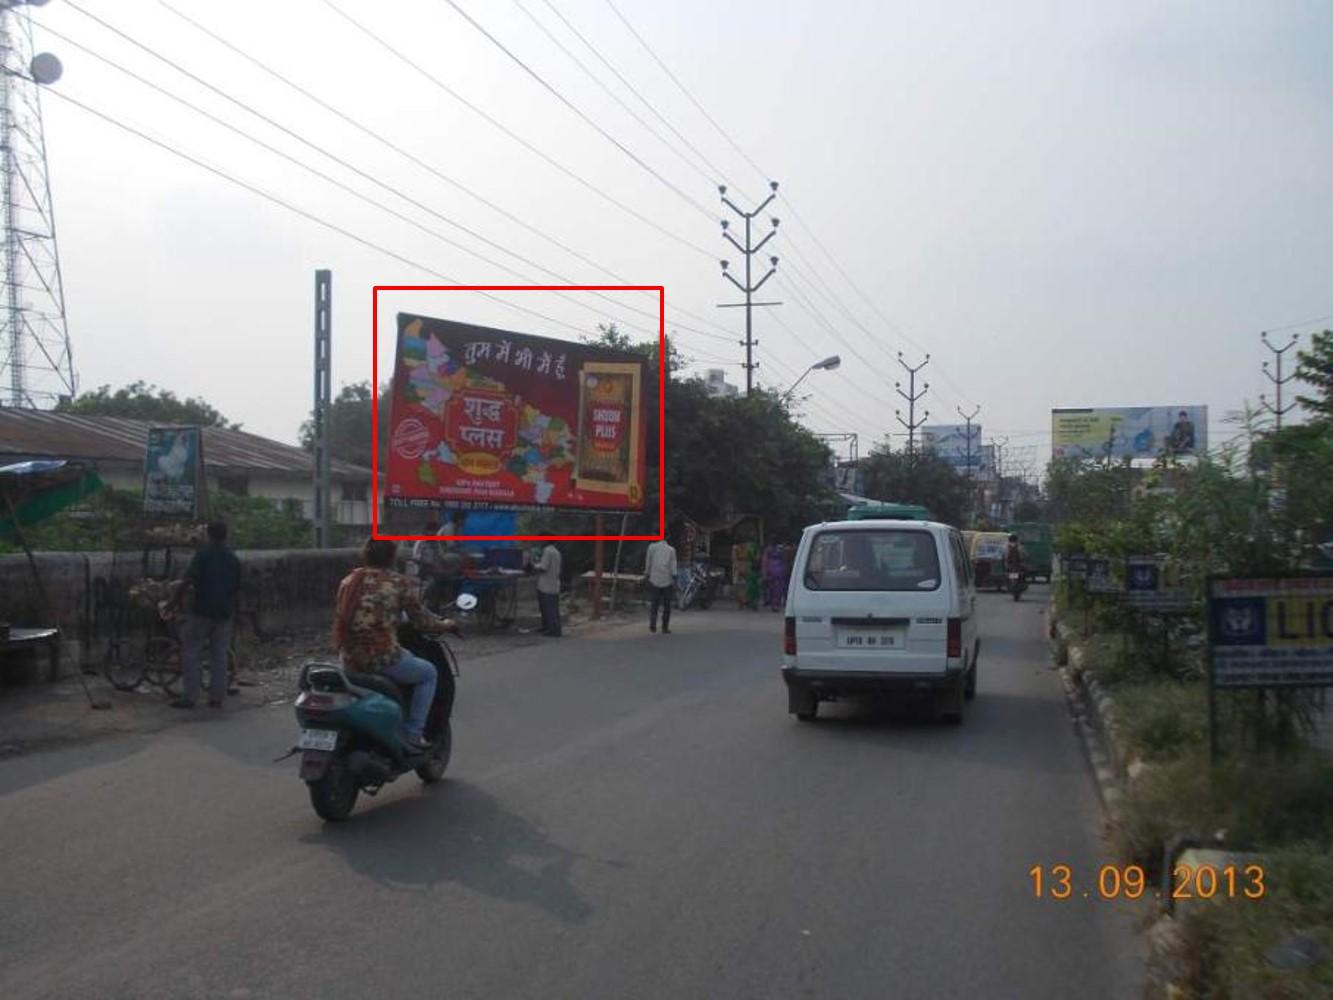 Opp.Cardiology, Rawatpur, Kanpur